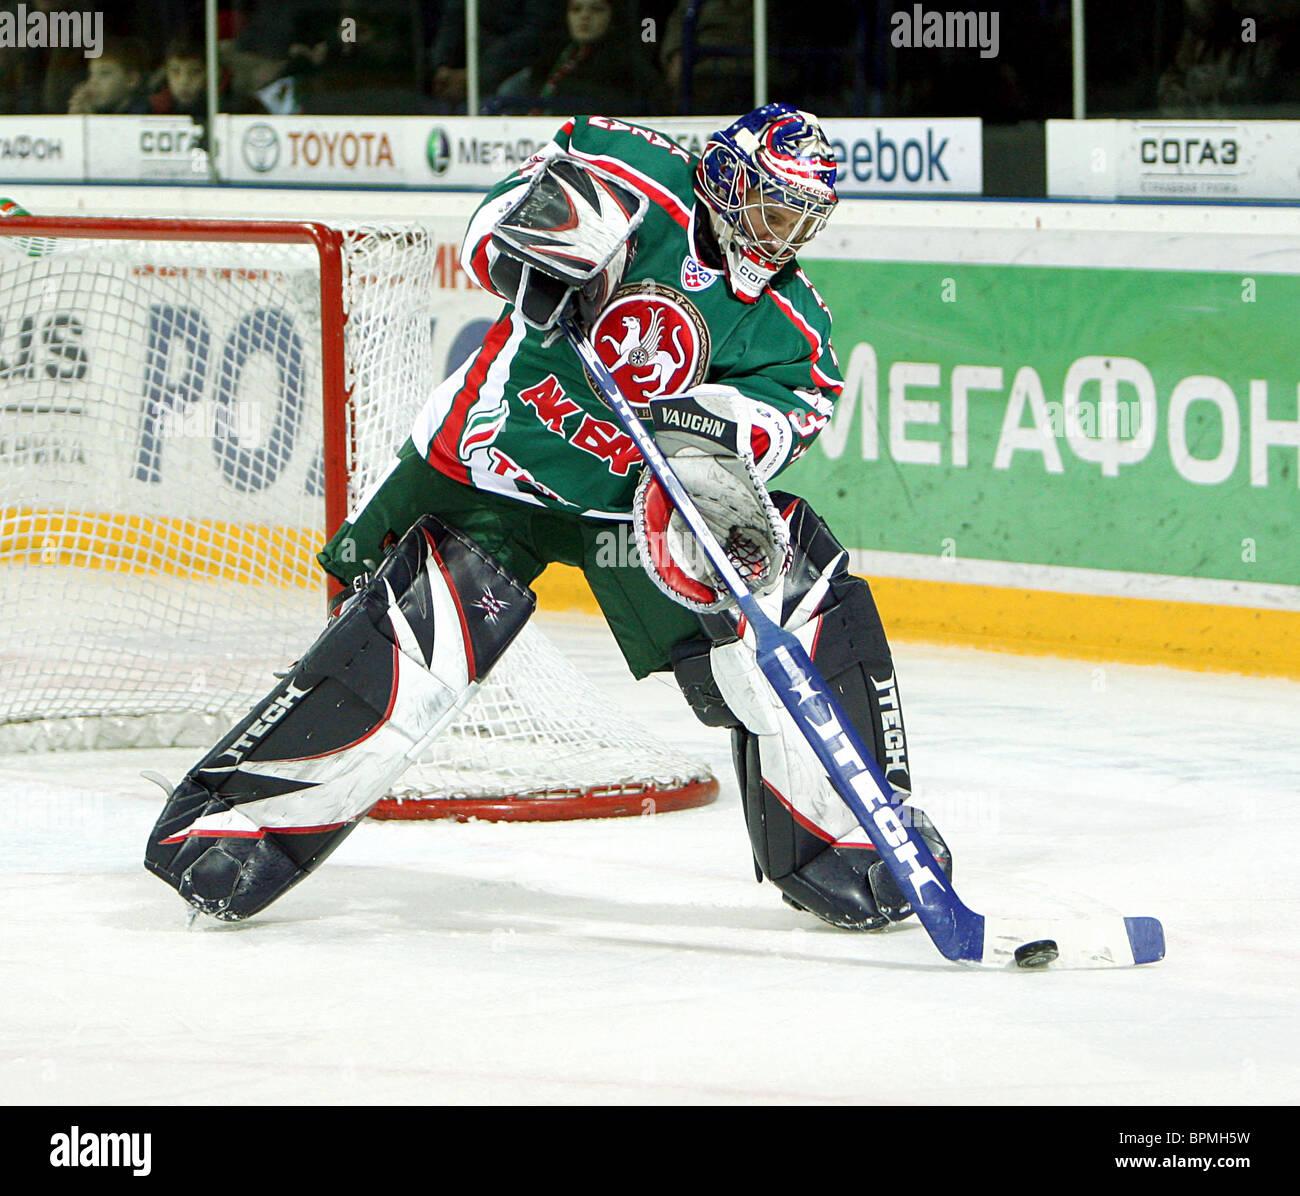 KHL match: AK Bars Kazan 0 - 2 Metallurg Magnitogorsk - Stock Image